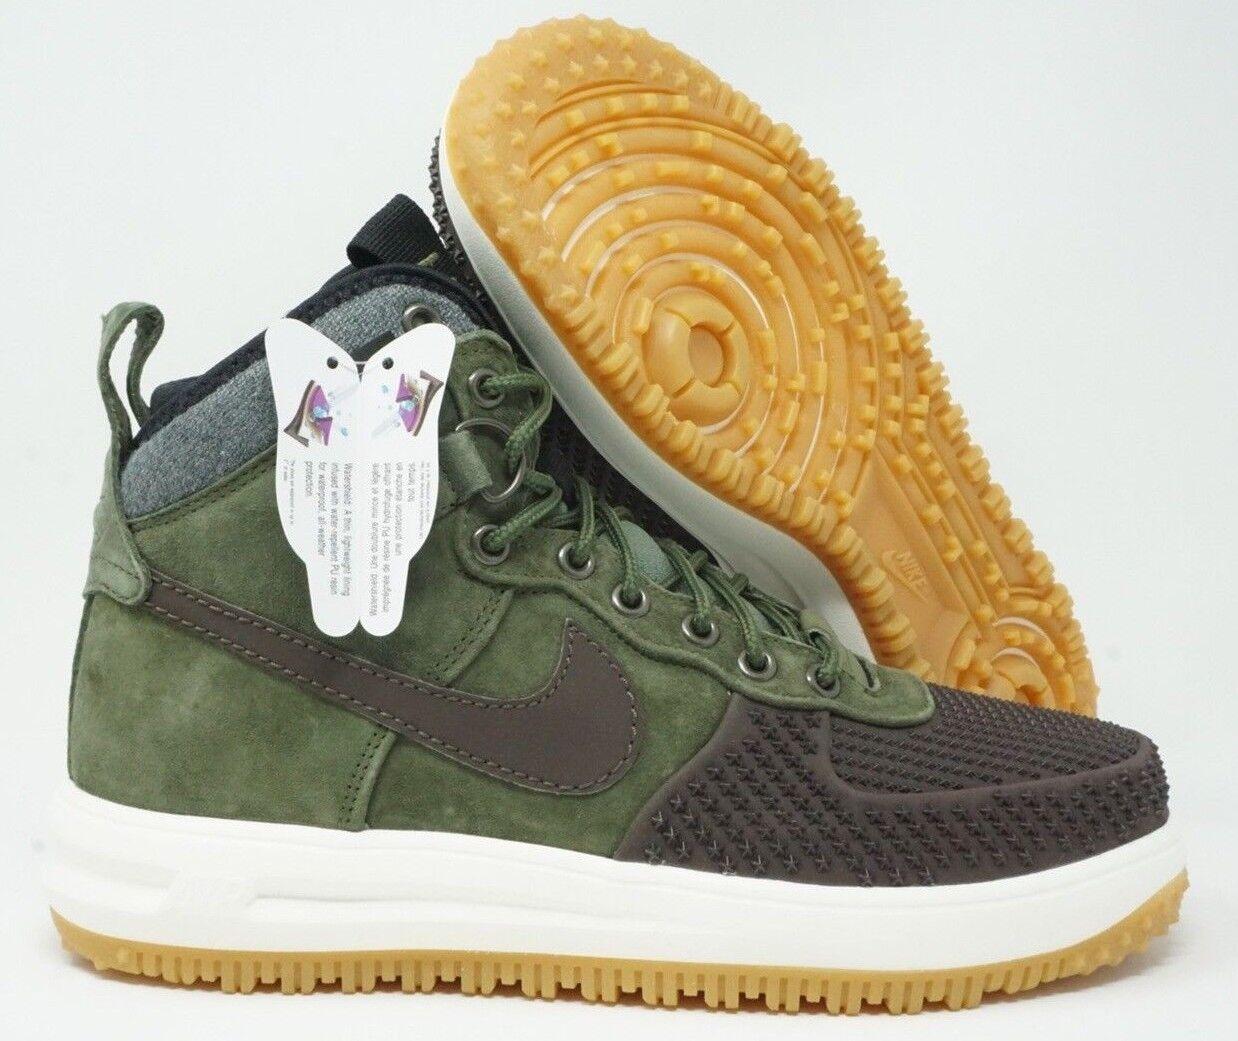 Nike Lunar Force 1 Mens Duckboot Brown Army Olive Black Size 7.5